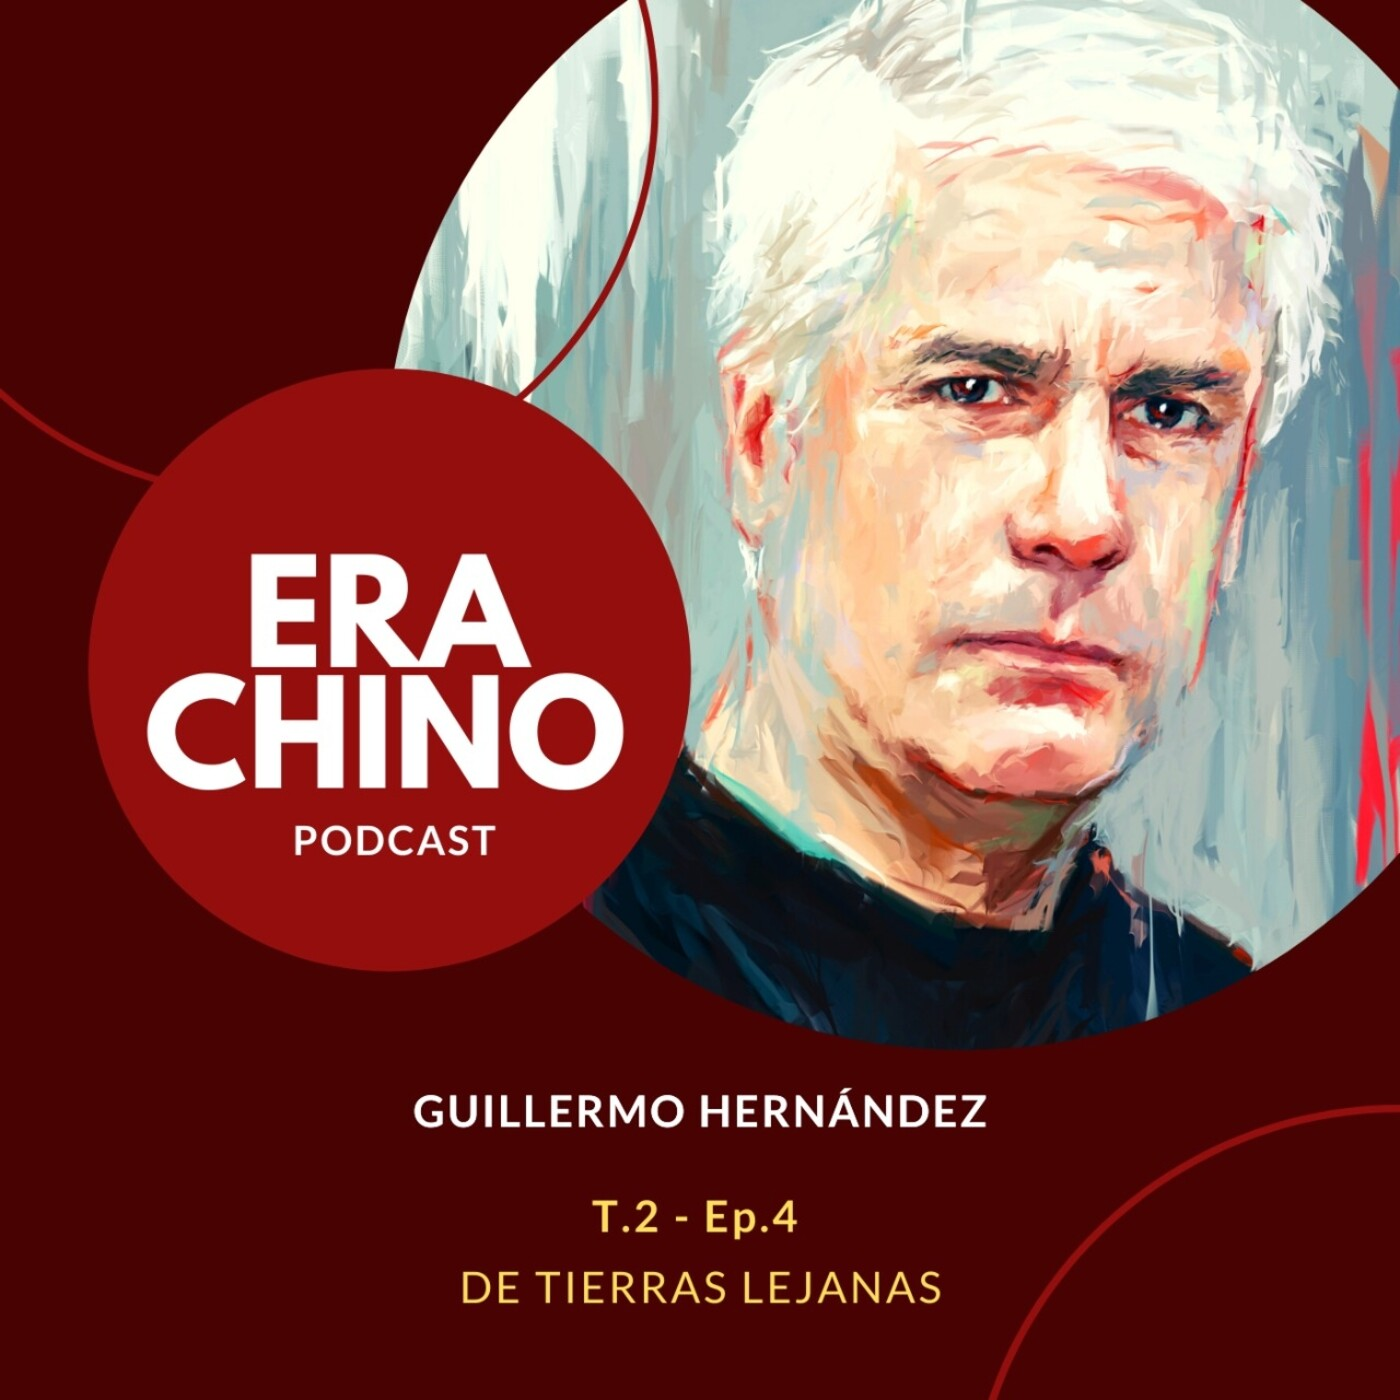 Era Chino T02E04 : Tierras Lejanas